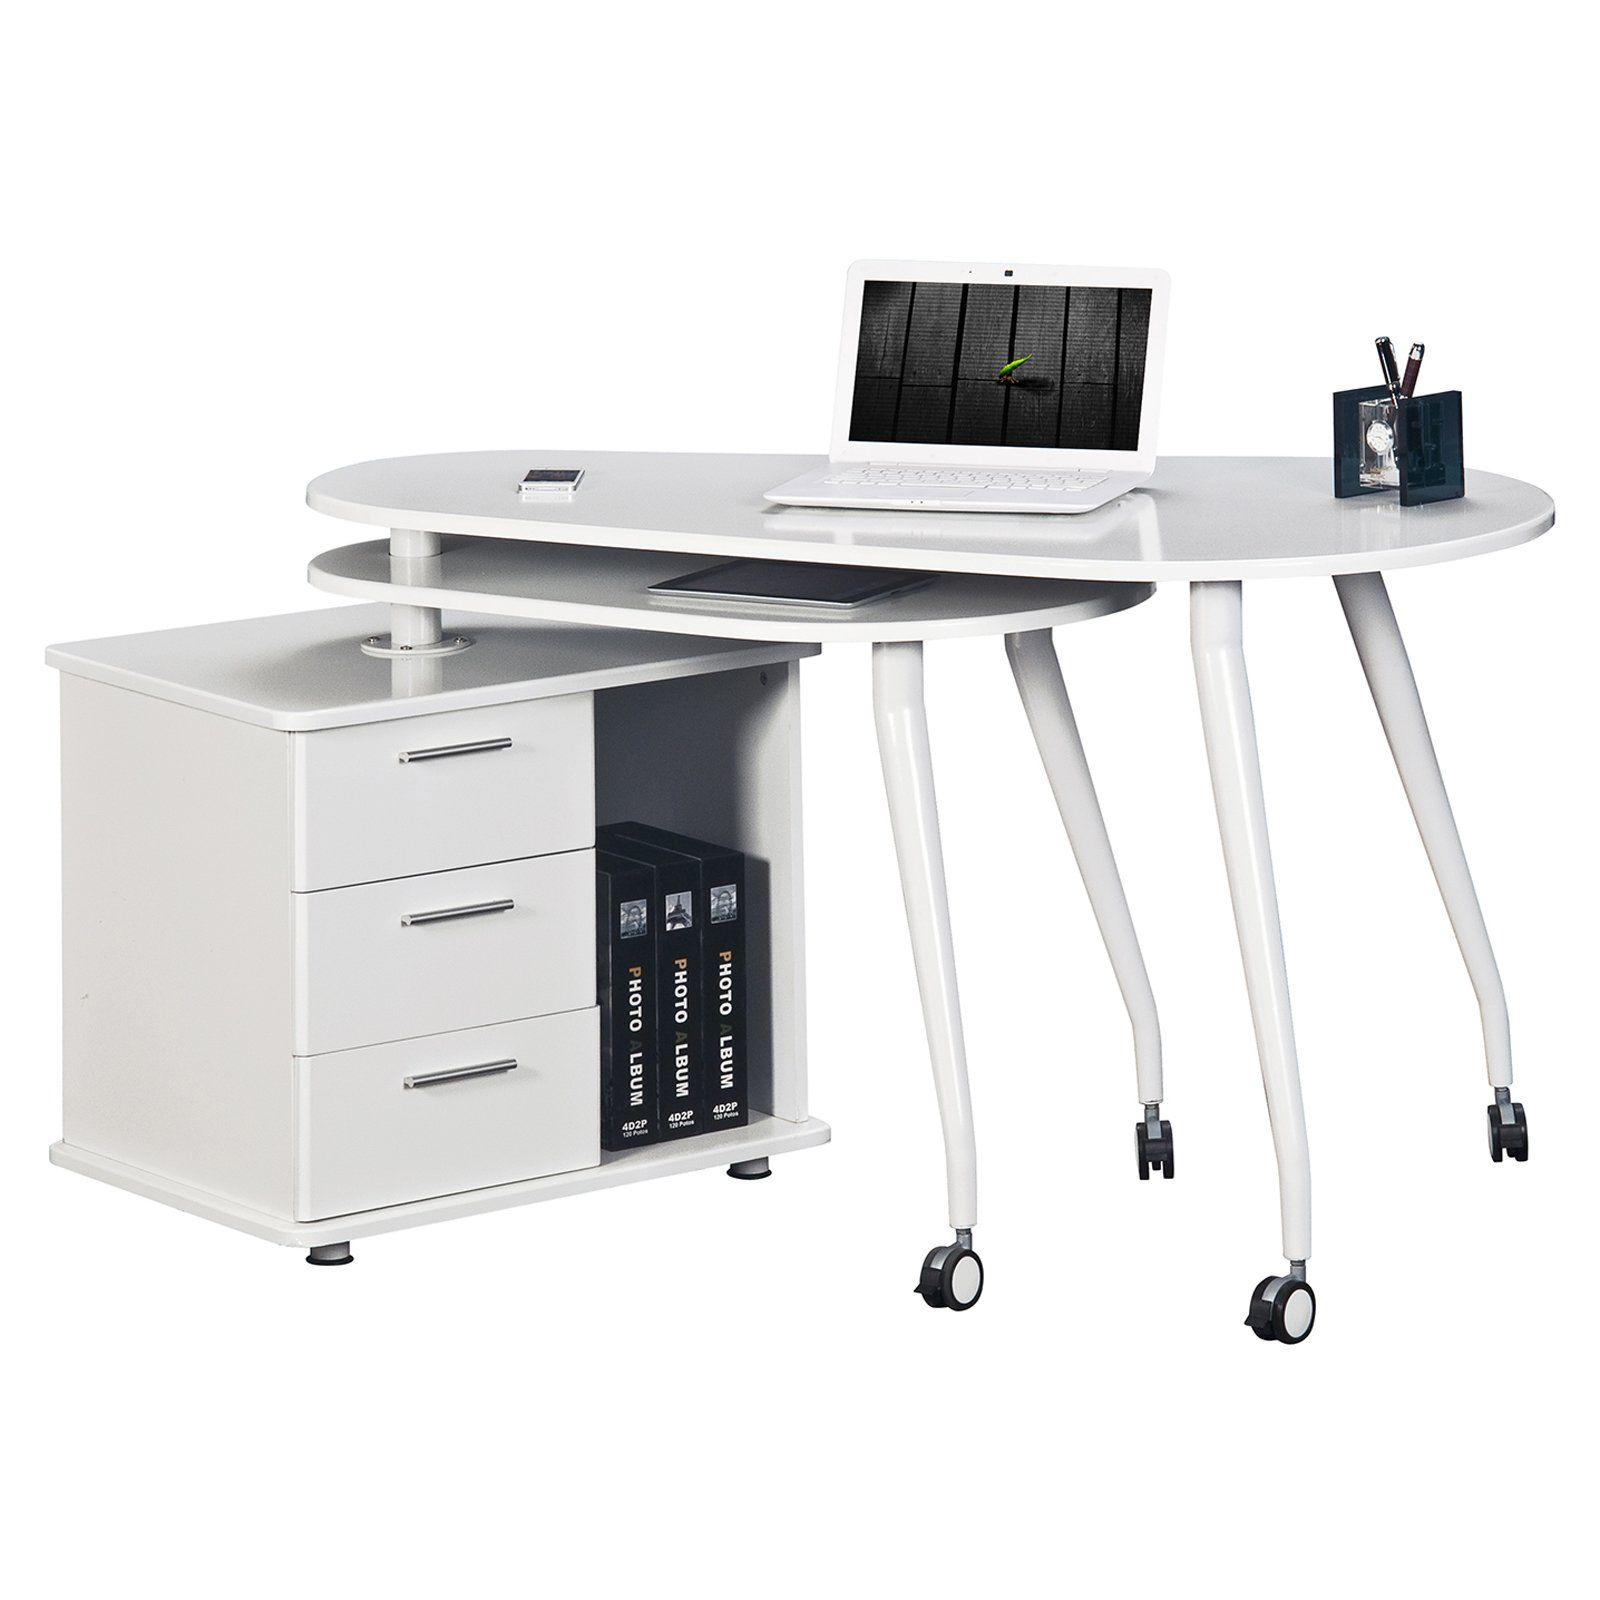 Pleasant Have To Have It Techni Mobili Rta 220Ab White Computer Desk Interior Design Ideas Clesiryabchikinfo